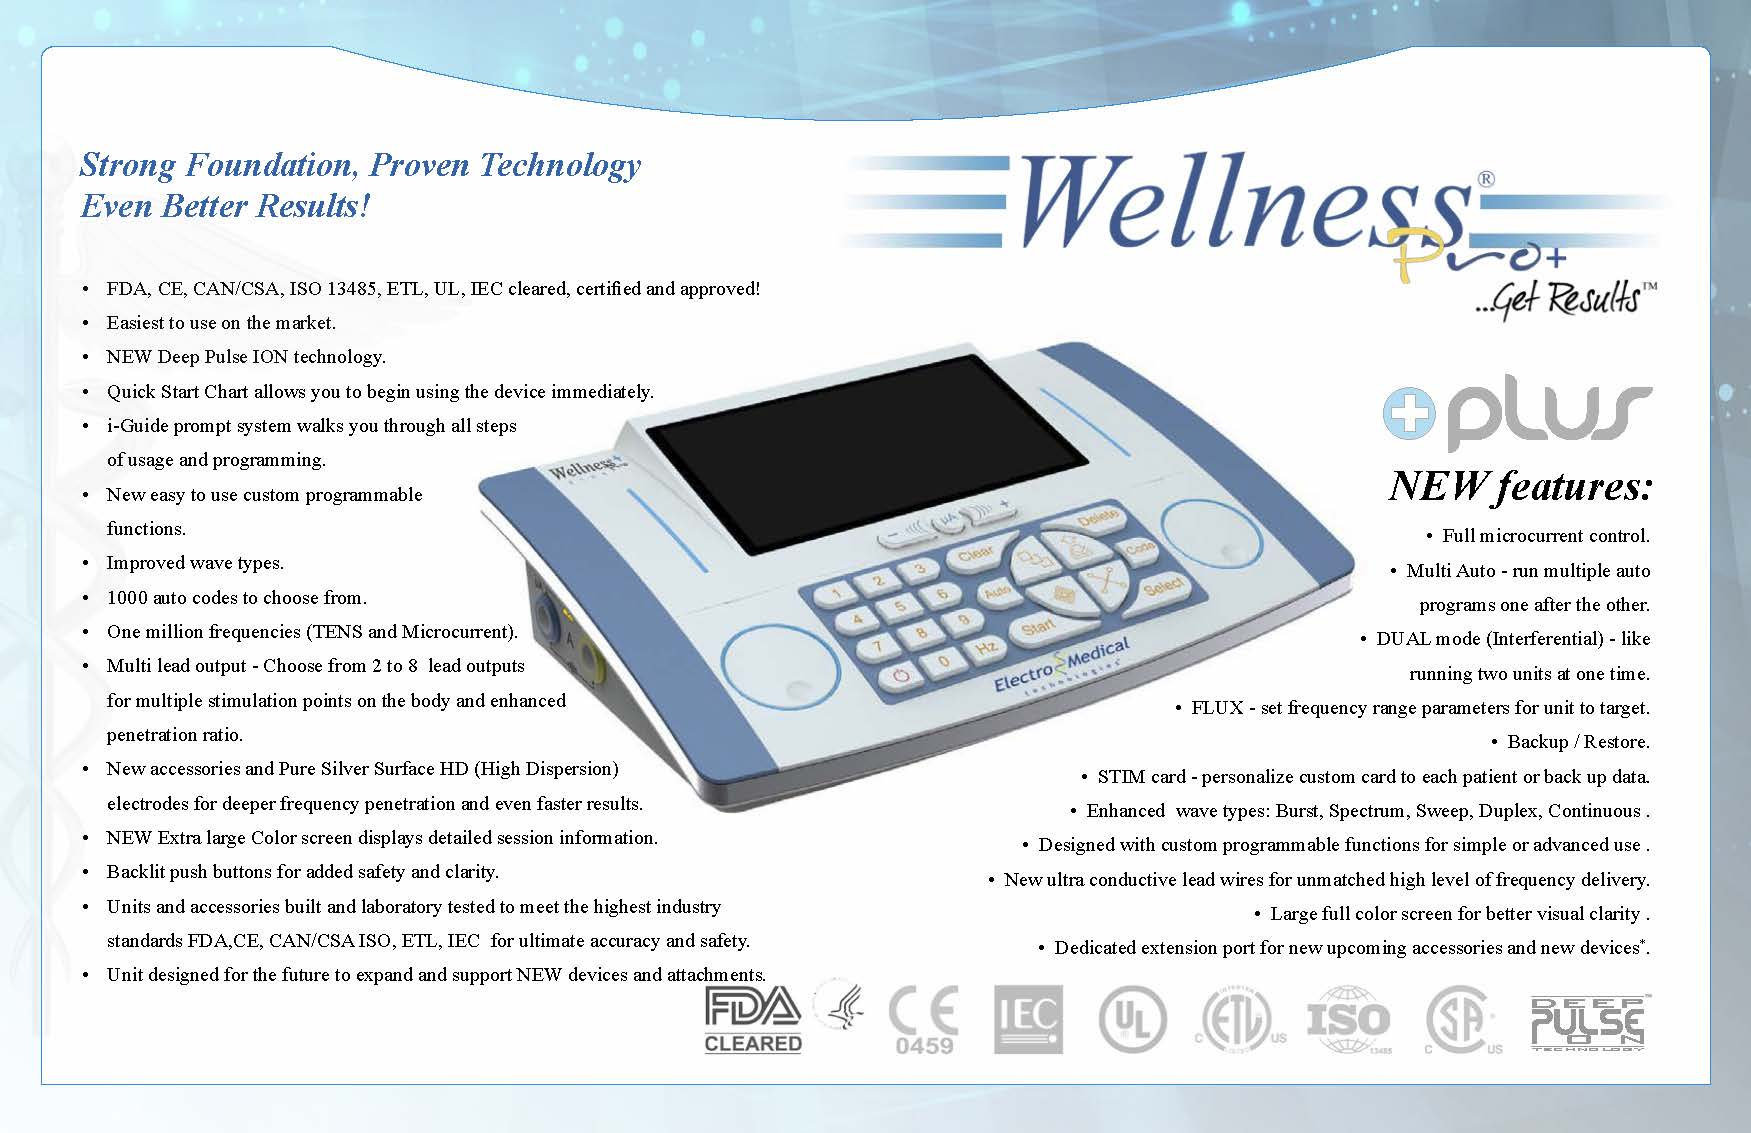 wellnessproplus.jpg